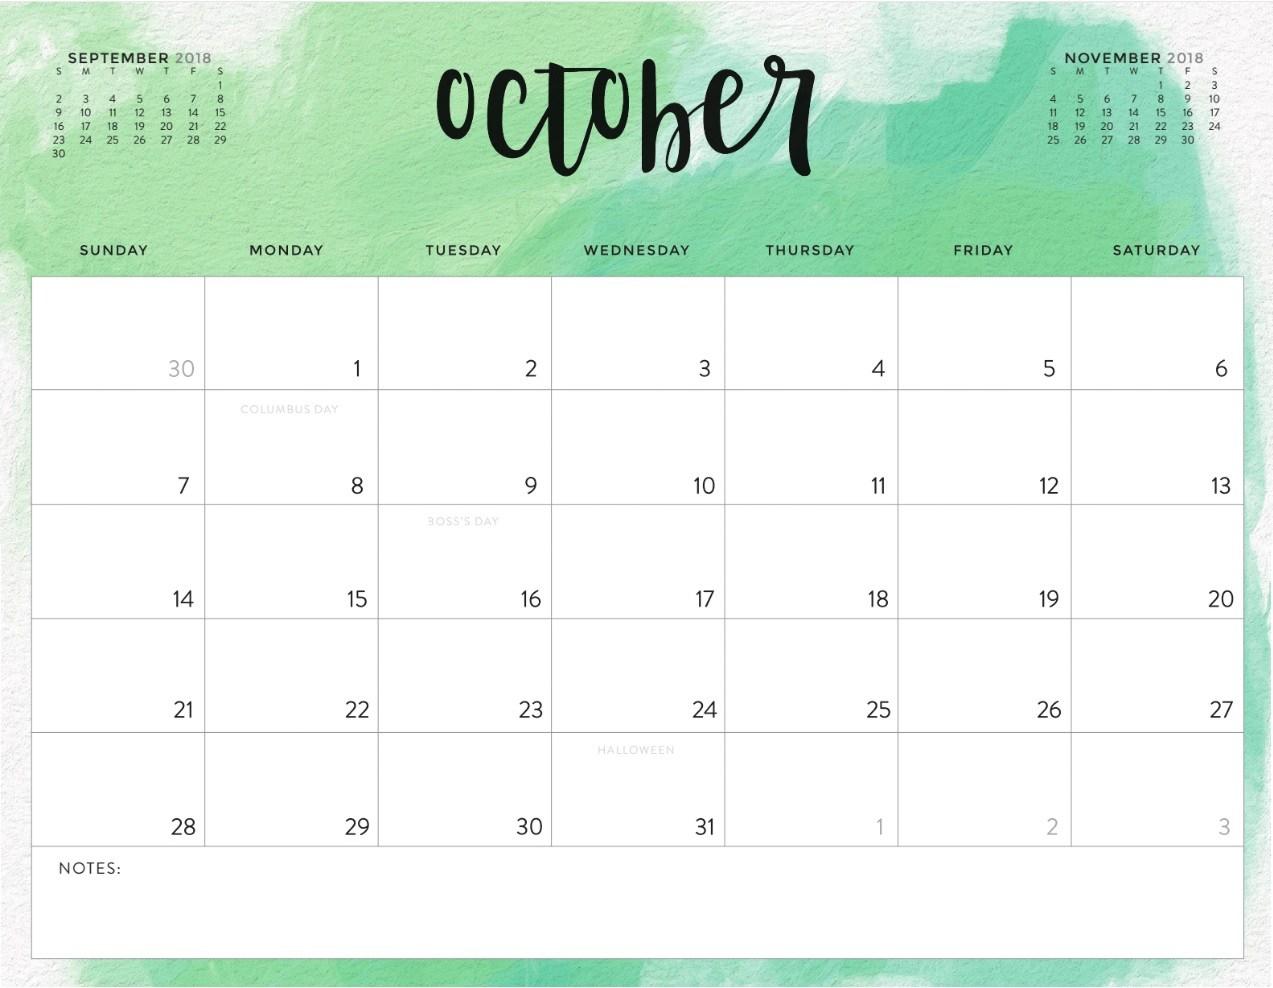 Free October 2018 Calendar to Print